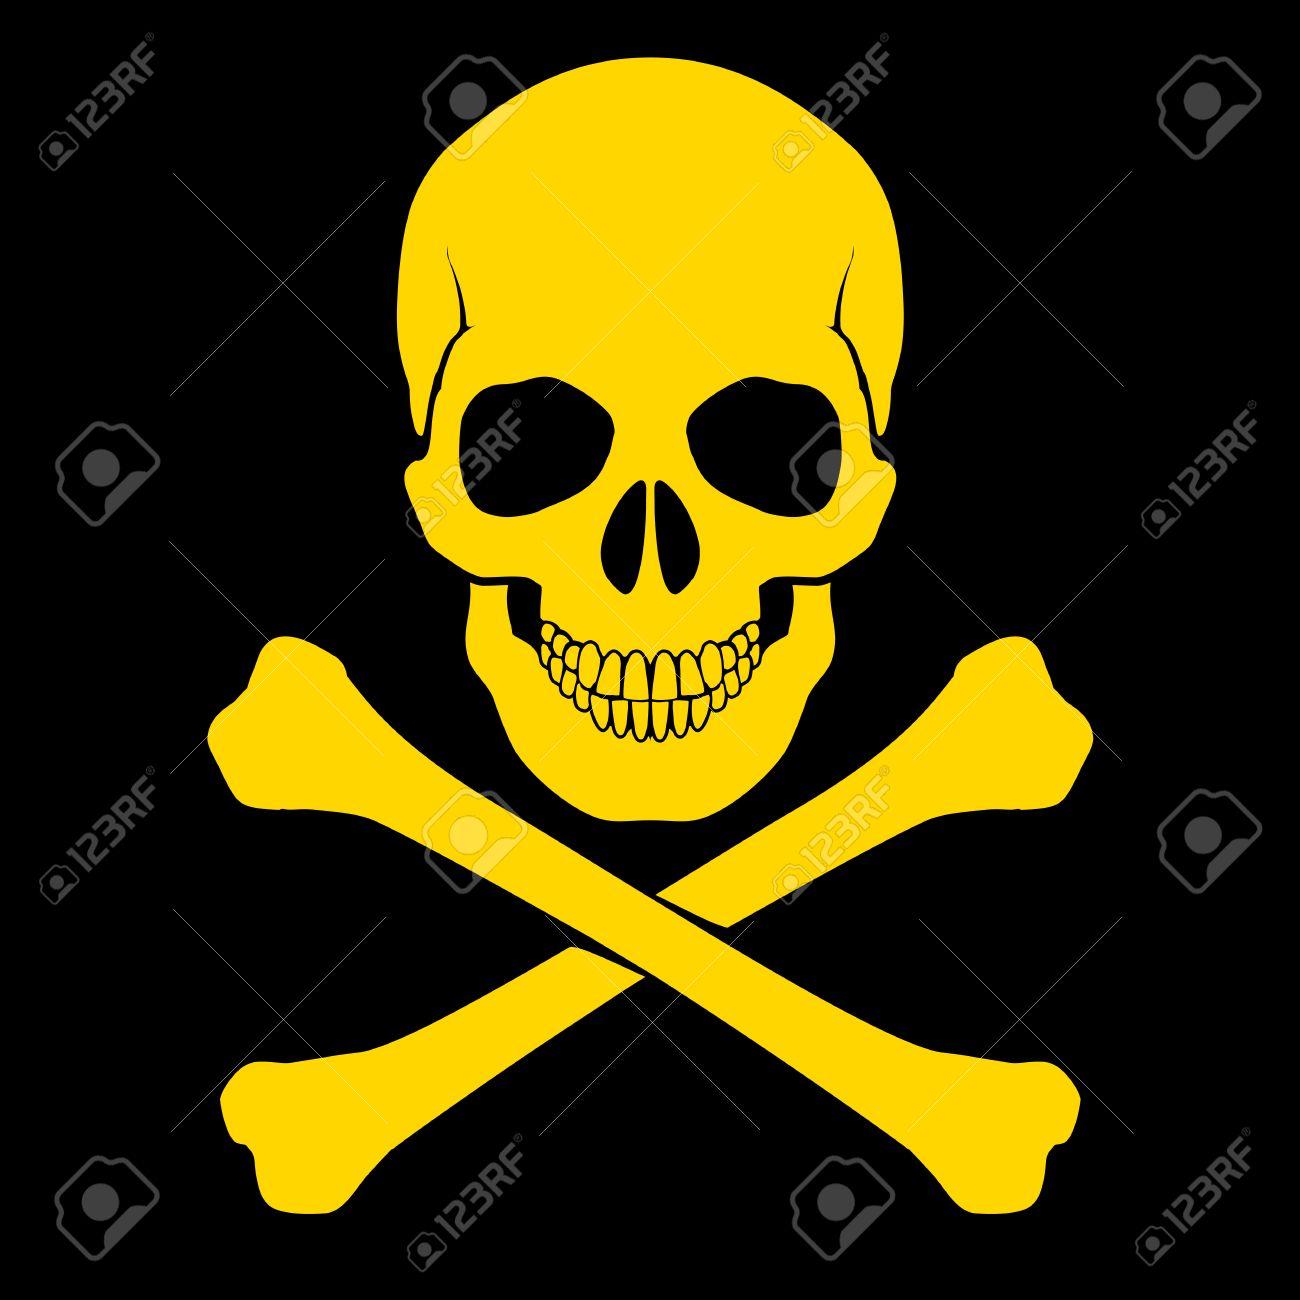 Yellow skull and cross-bones on black as symbol of danger Stock Vector - 25942632